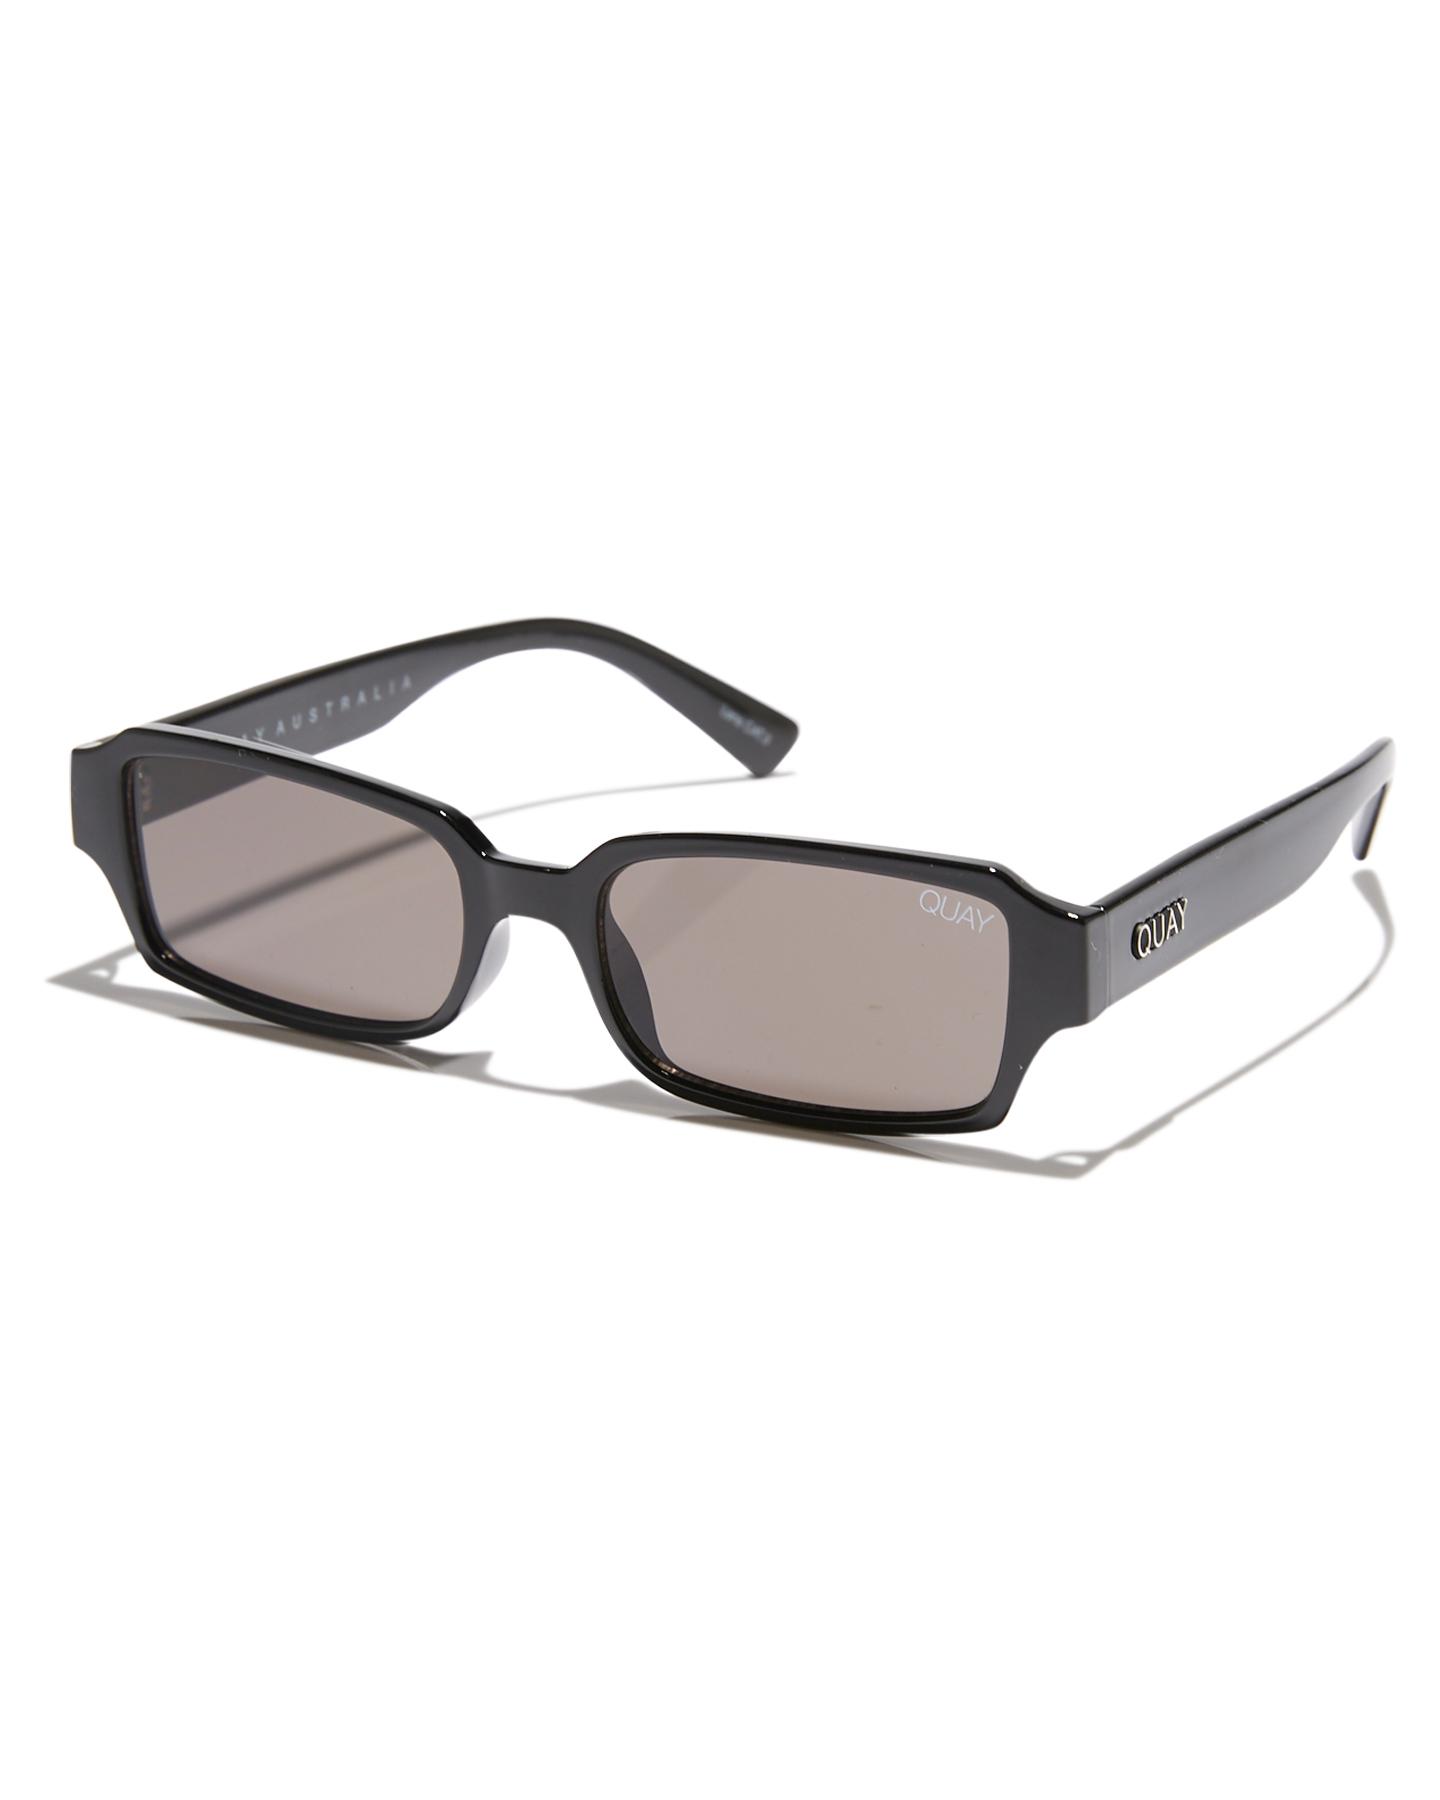 45a5a7e12b6 Quay Eyewear Sofia Richie Strange Love Sunglasses - Black Smoke ...